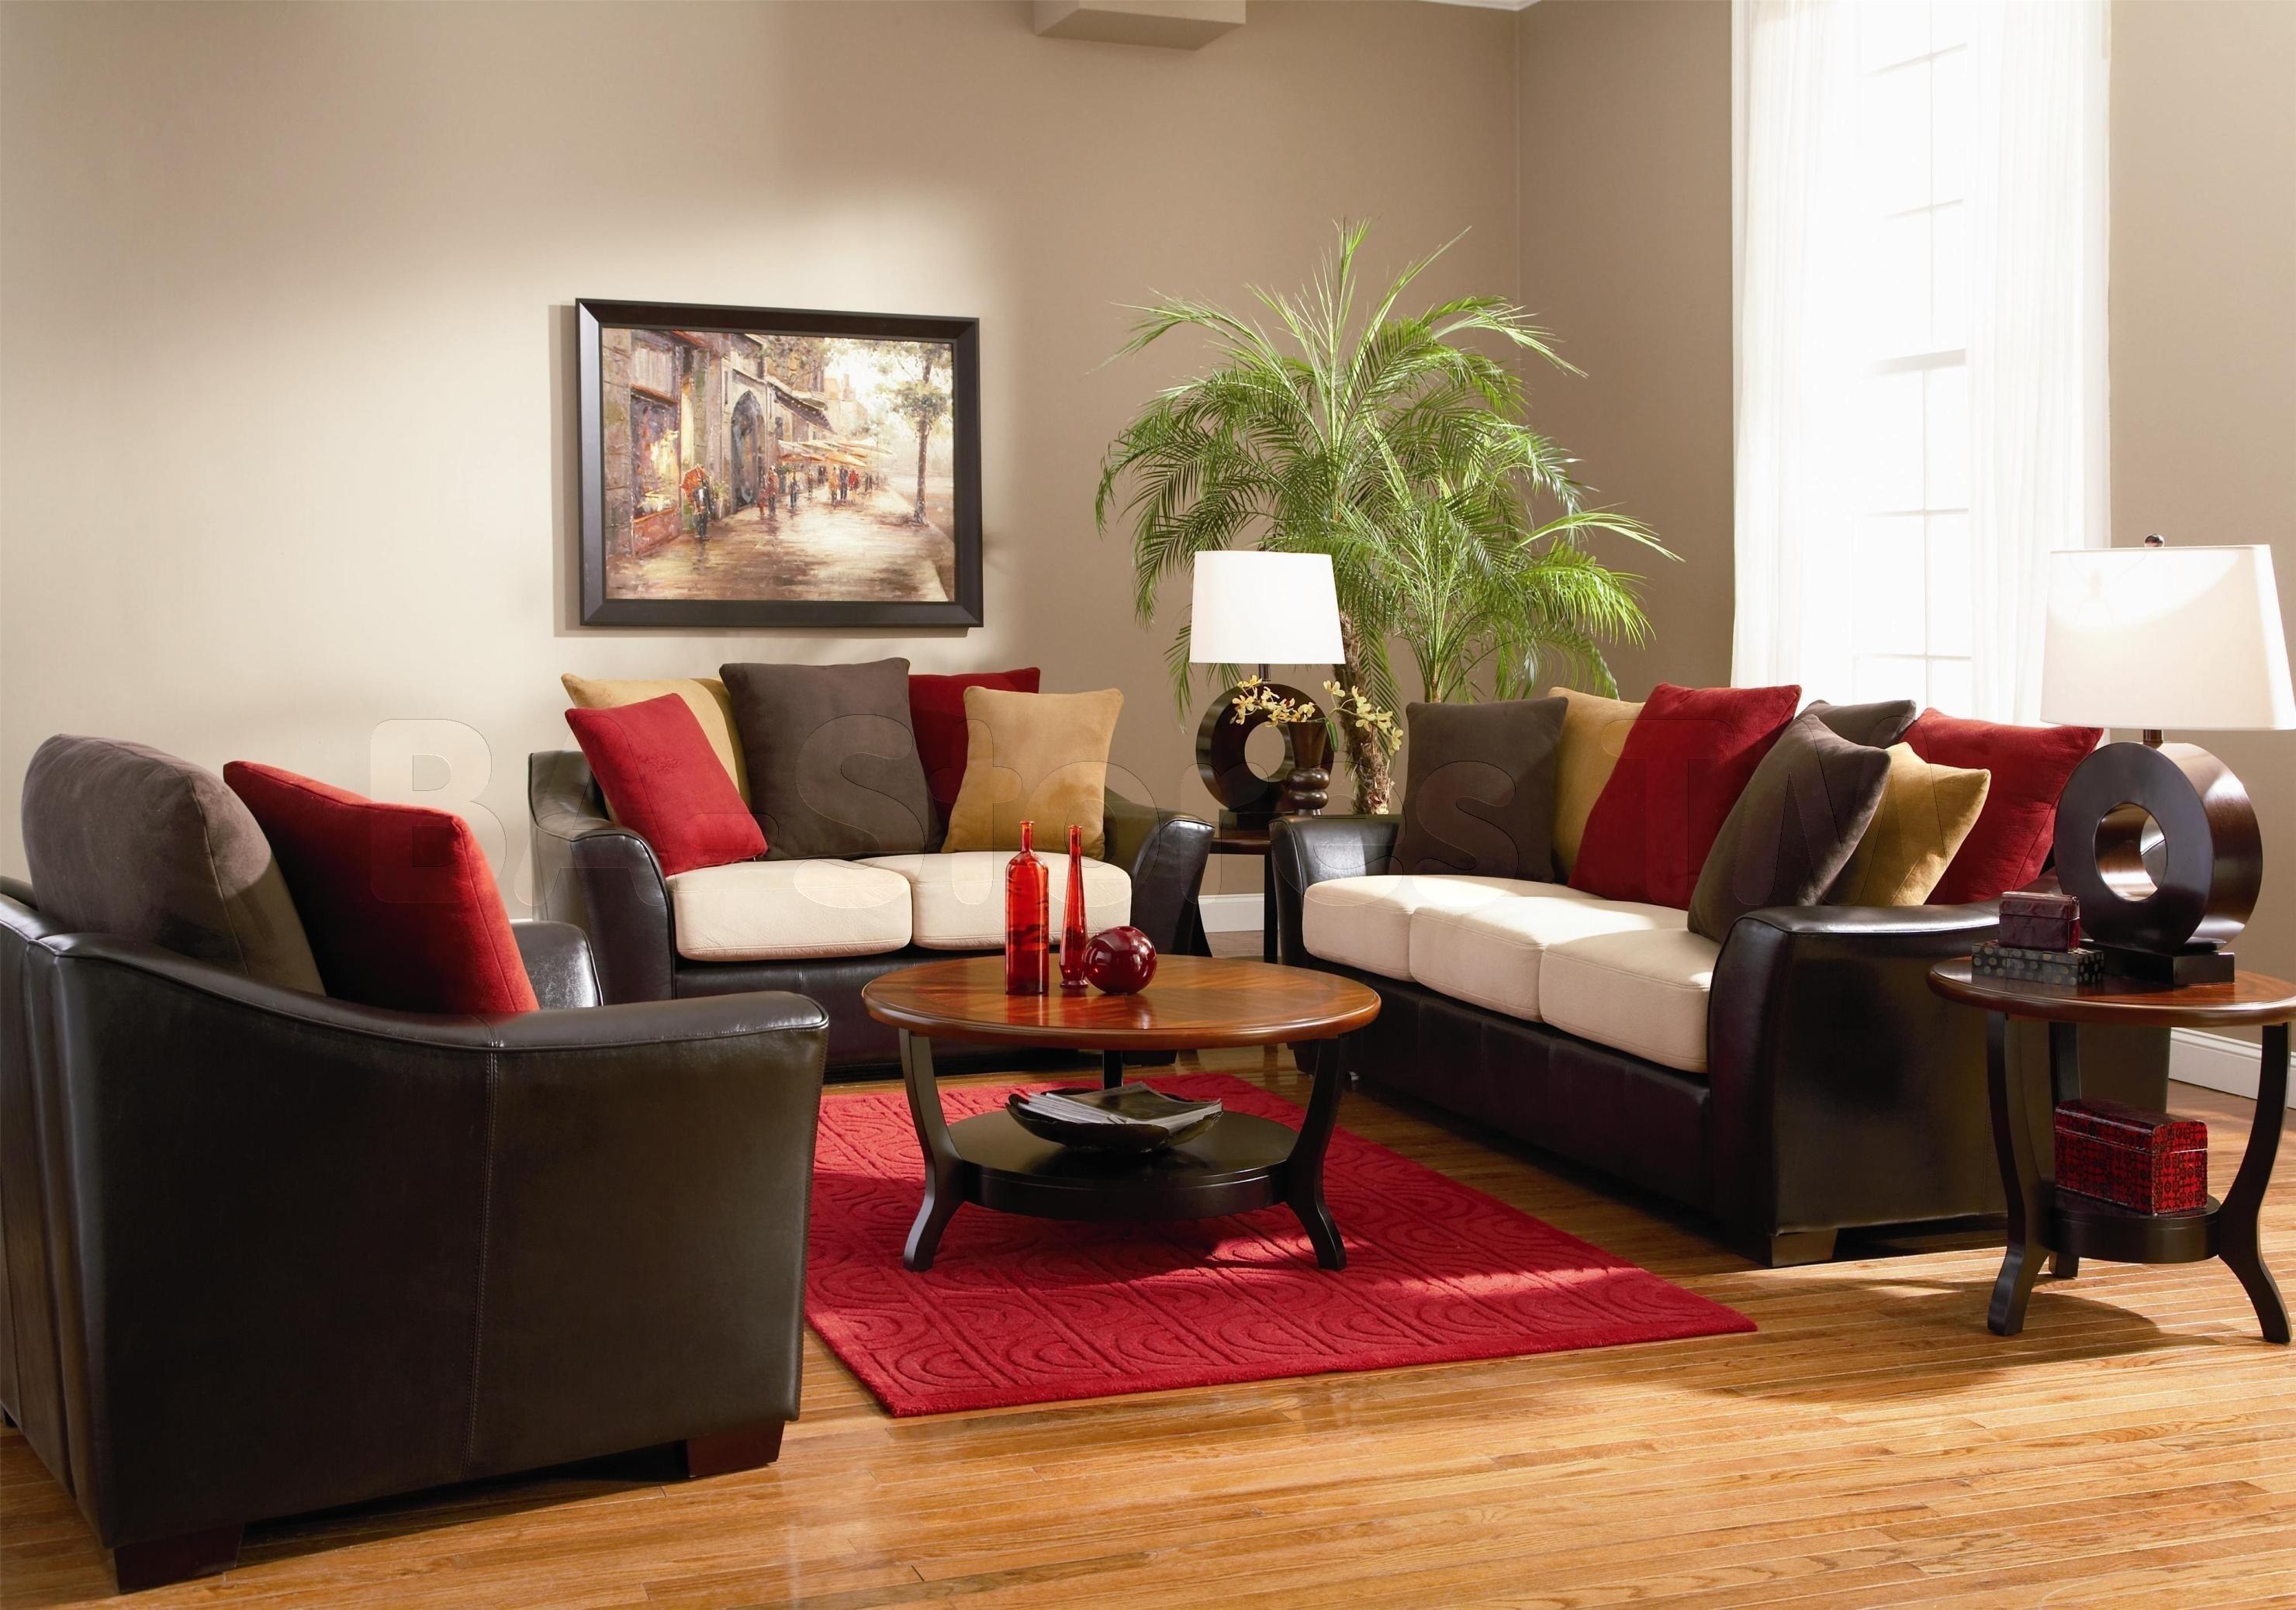 brown sofa decorating living room ideas – living room decorating design